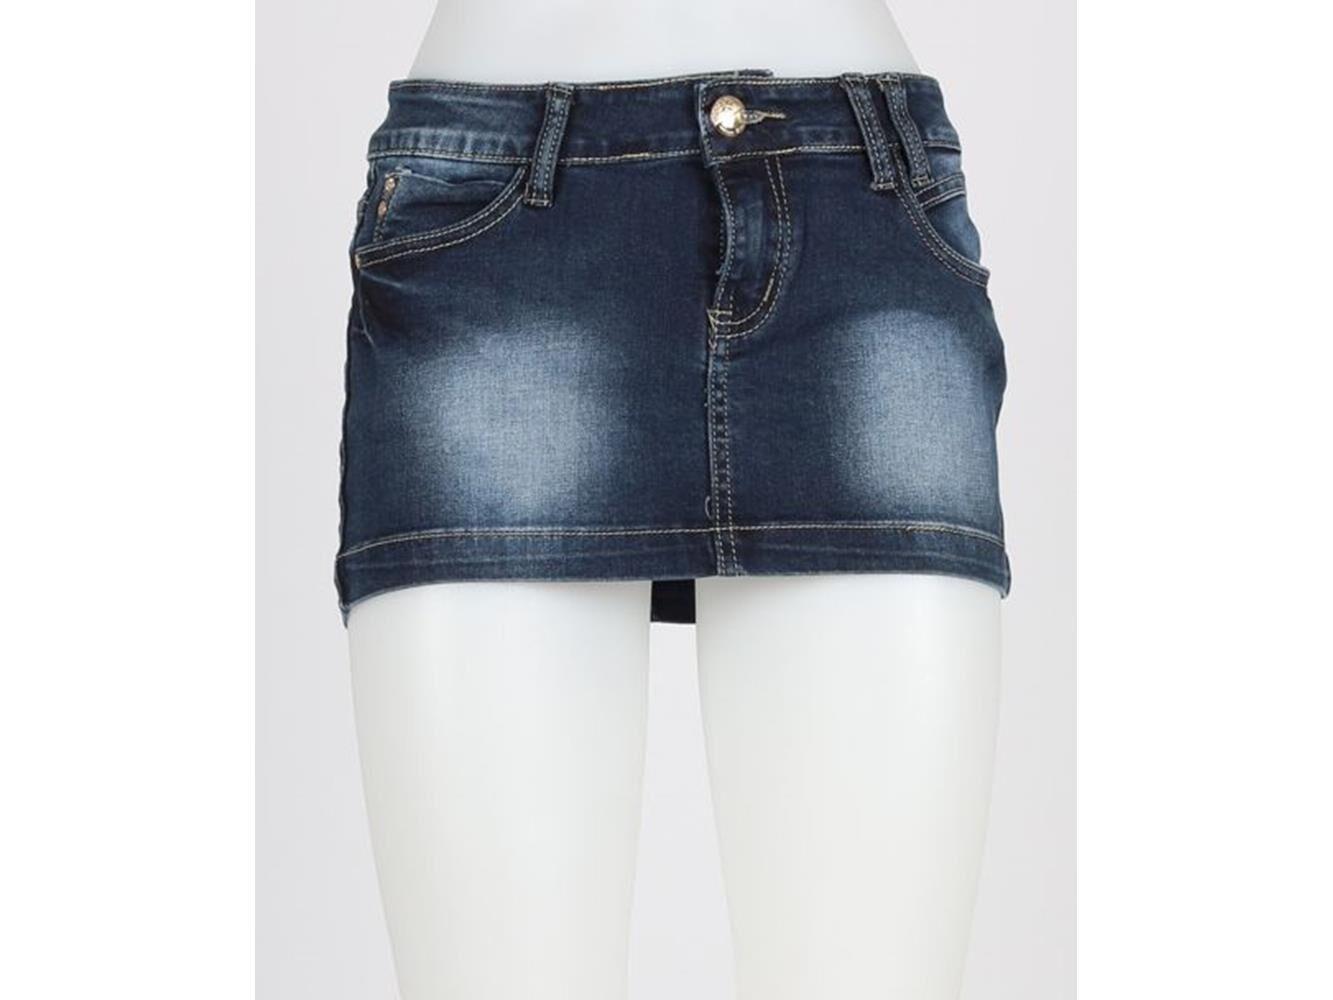 Minigonna Donna Di Jeans